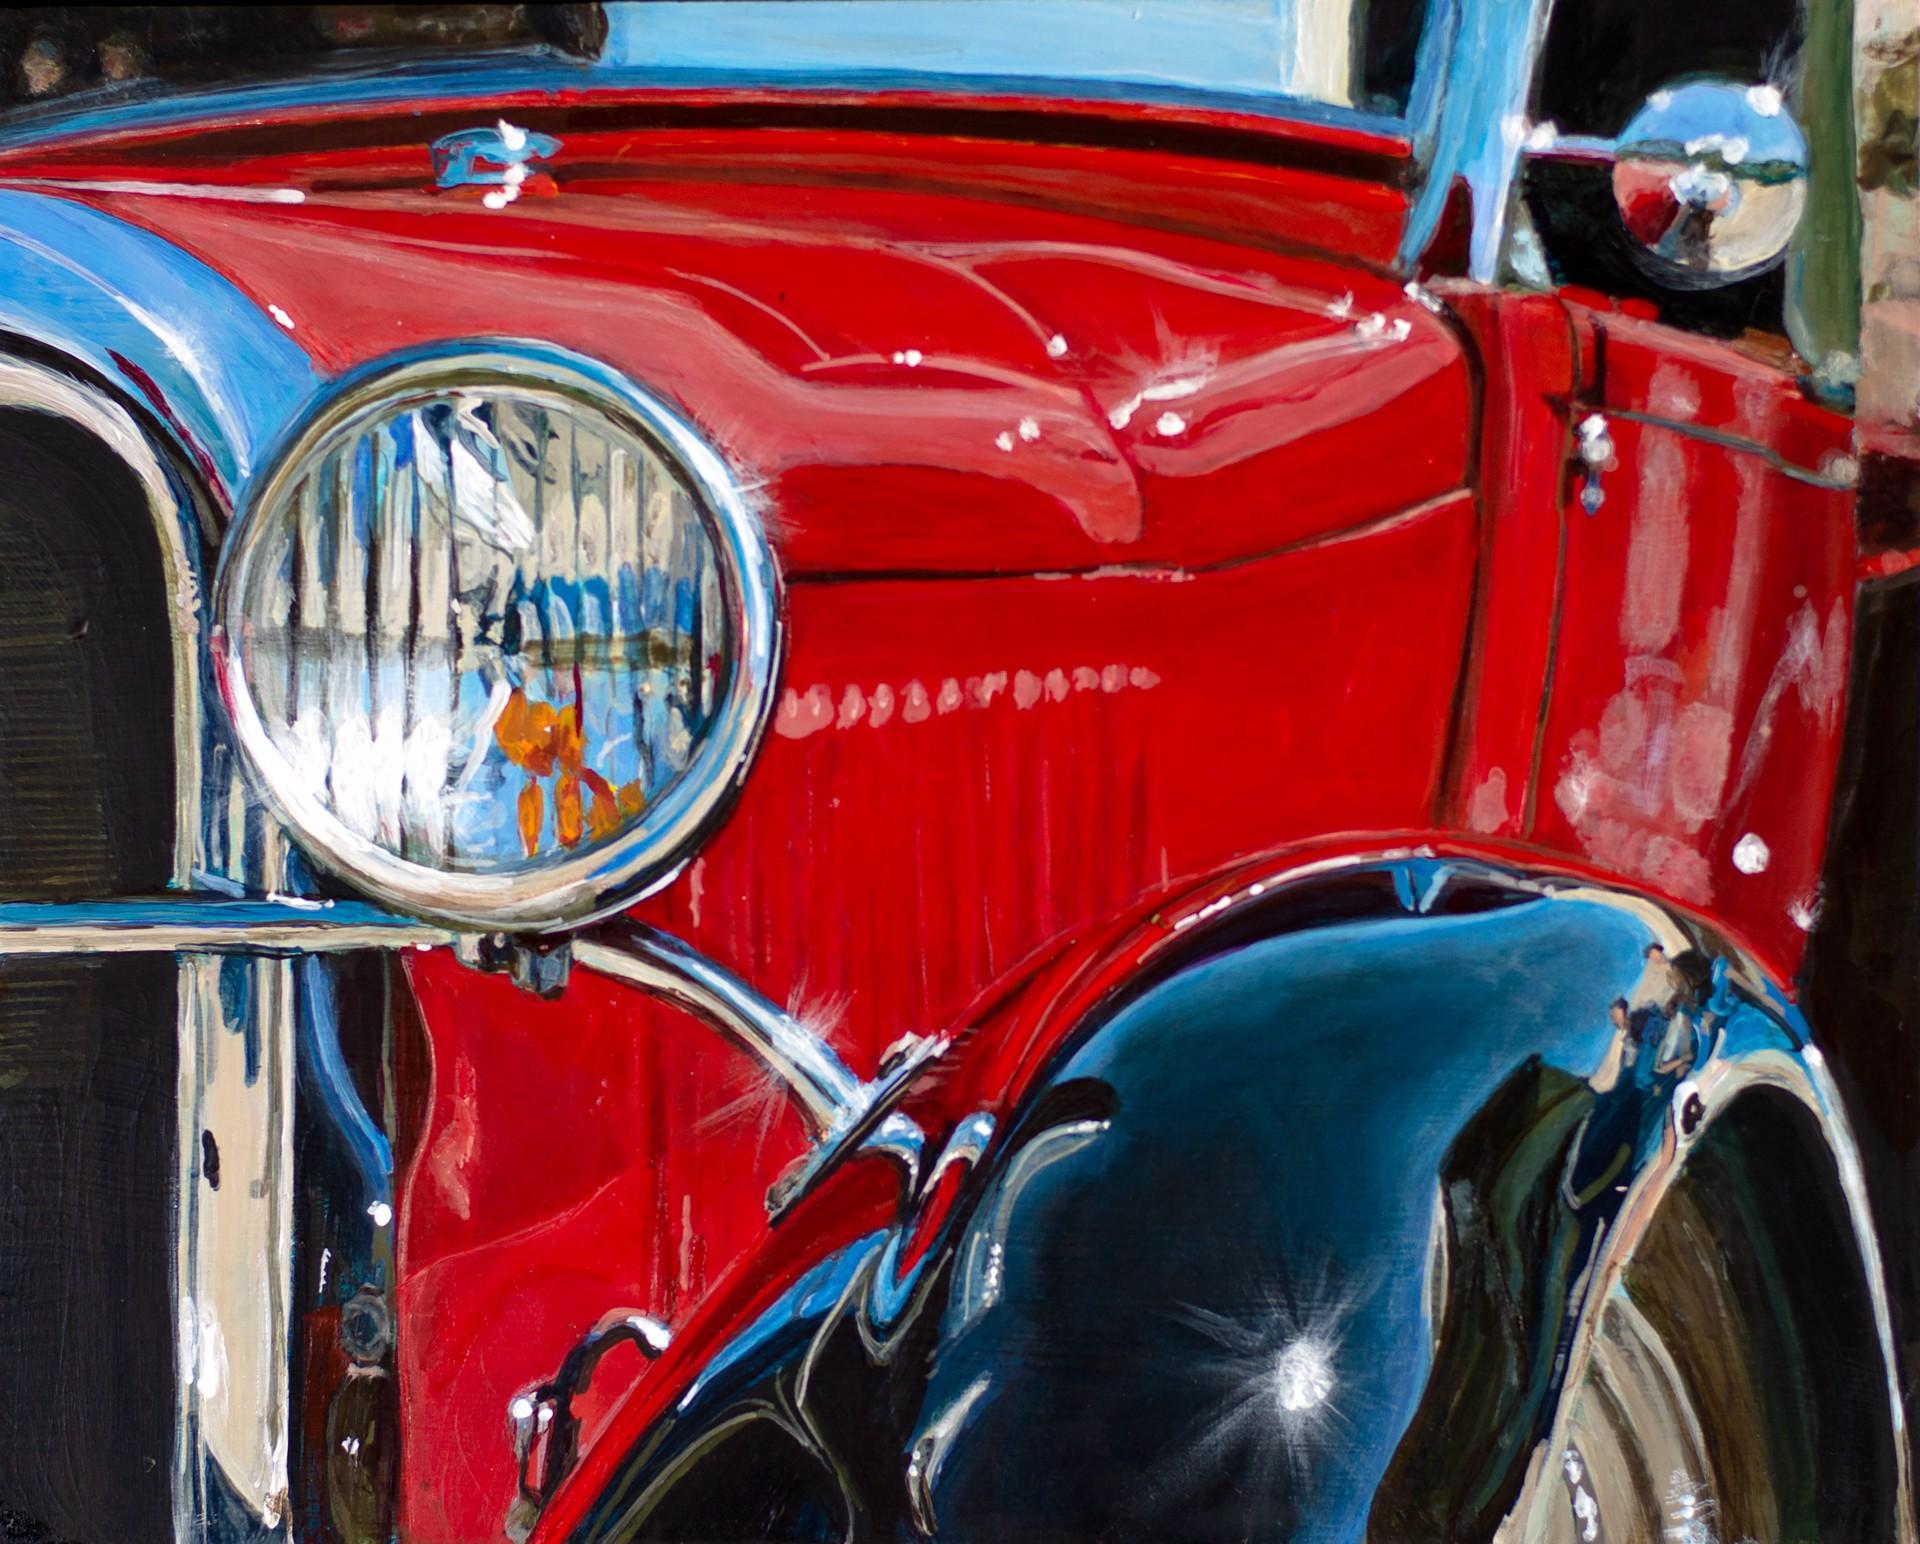 1930 Ford Model A by Shan Fannin